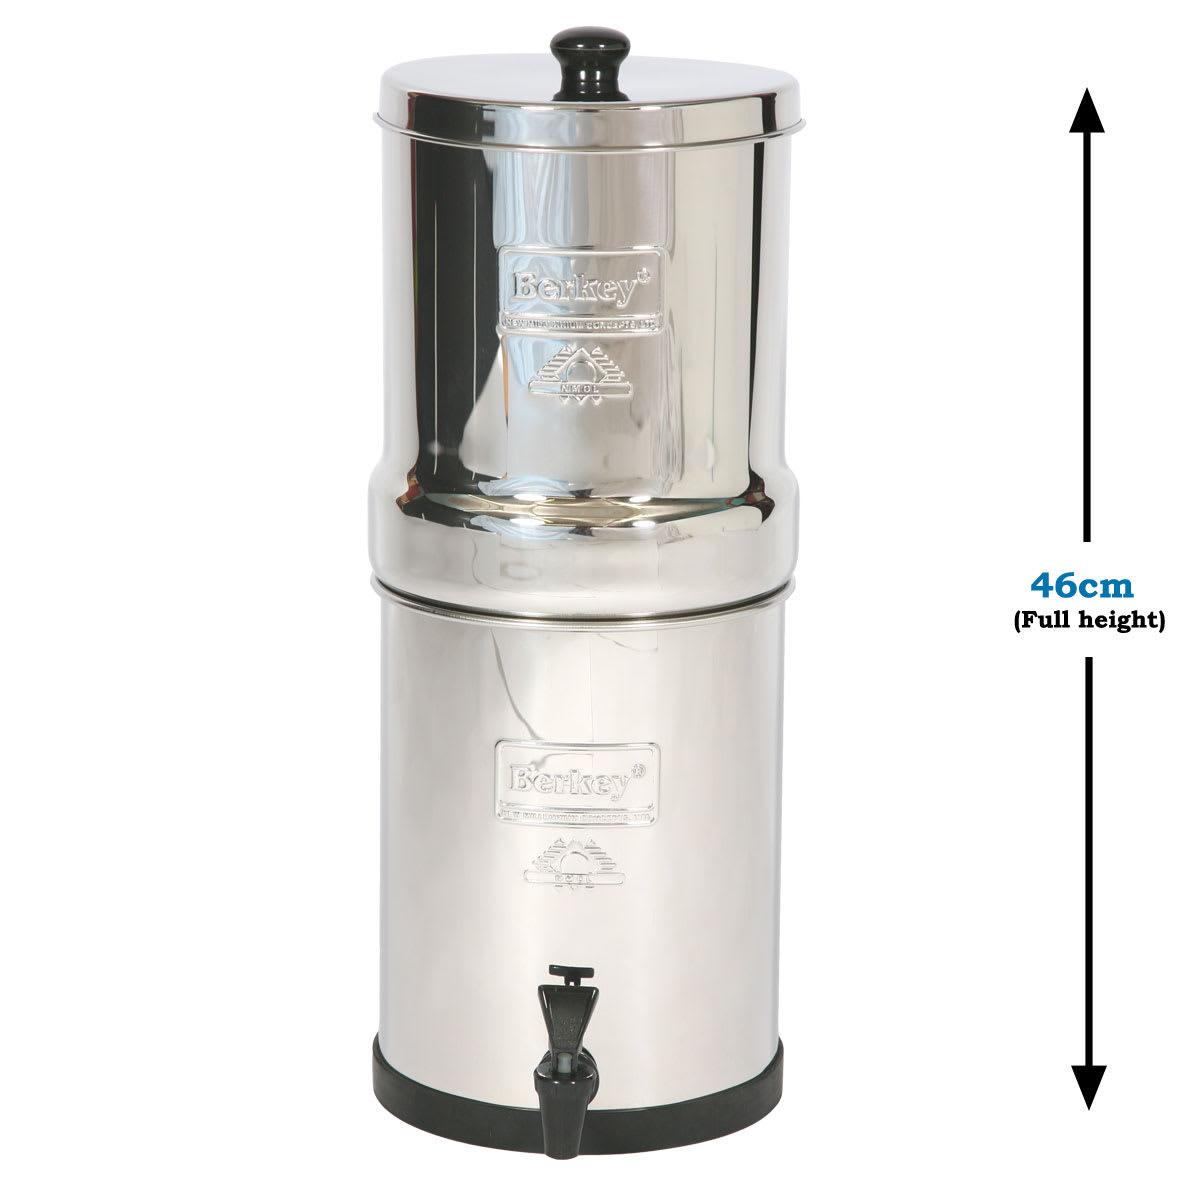 Budget Travel Berkey Water Filter System Berkey Water